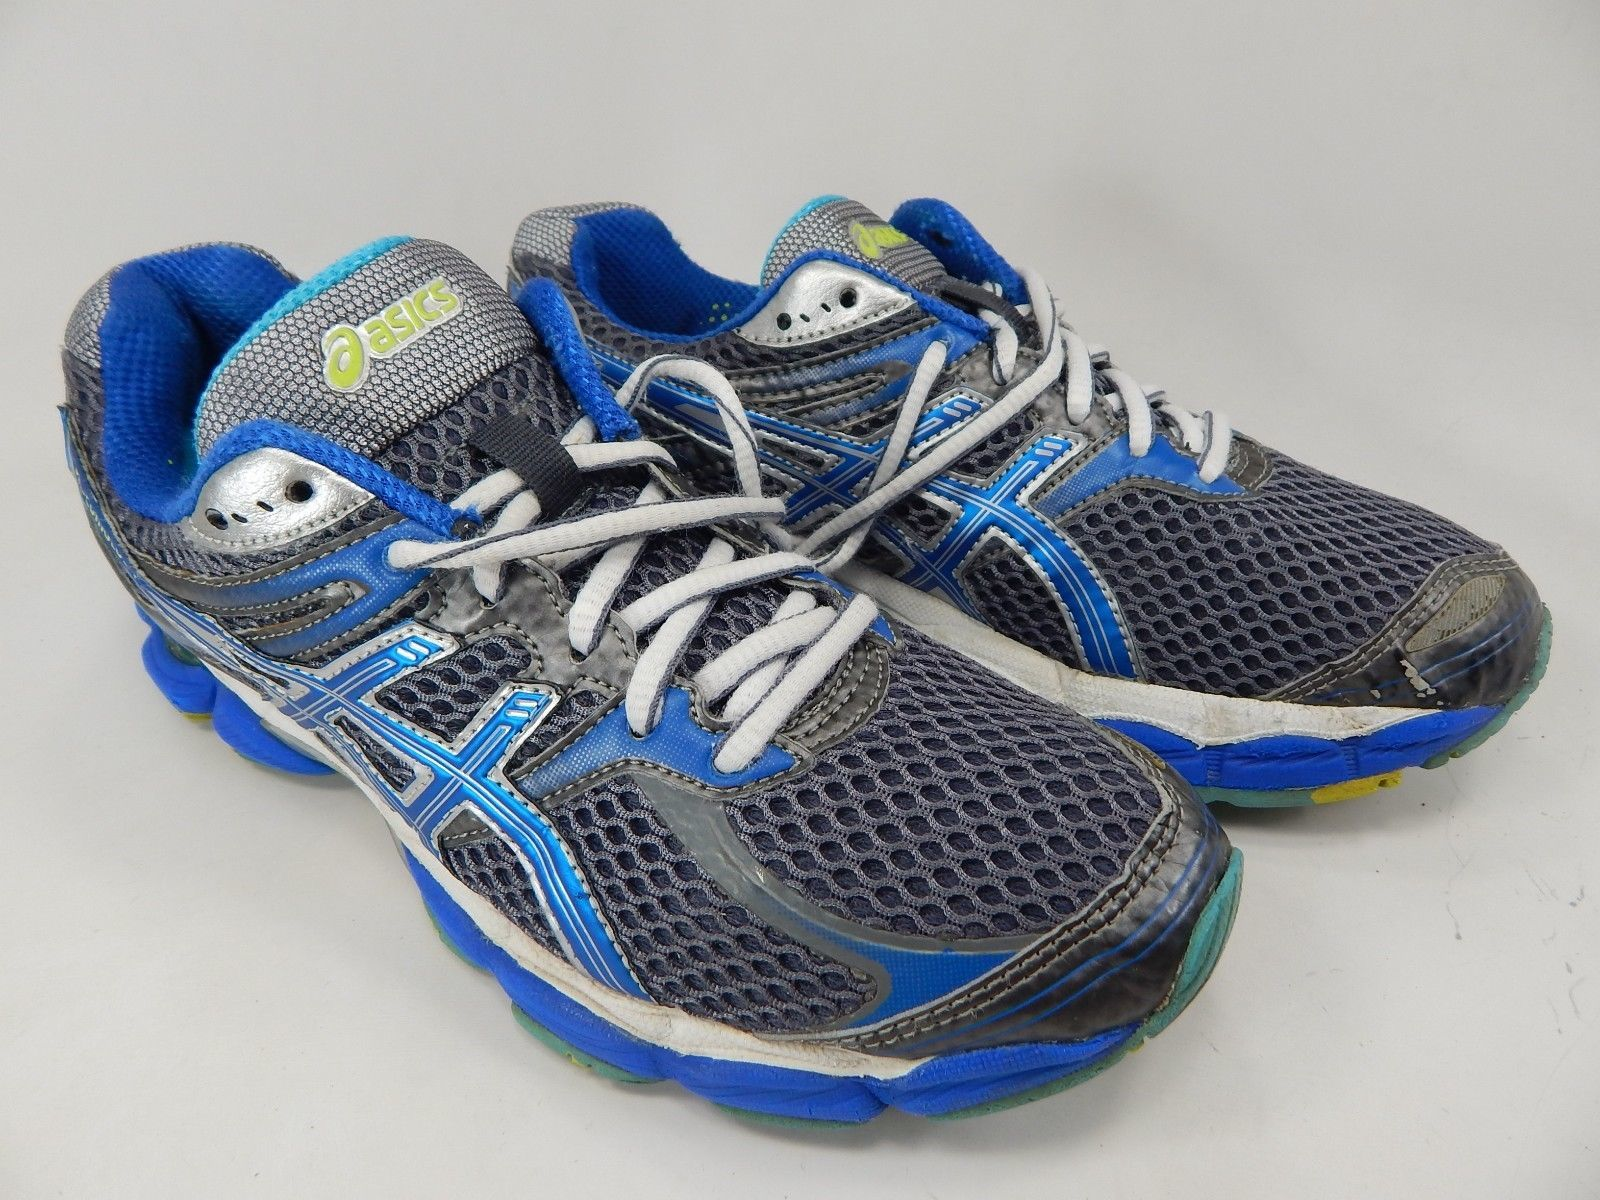 Asics Gel Cumulus 14 Size 9 M (B) EU 40.5 Women's Running Shoes Gray T296N